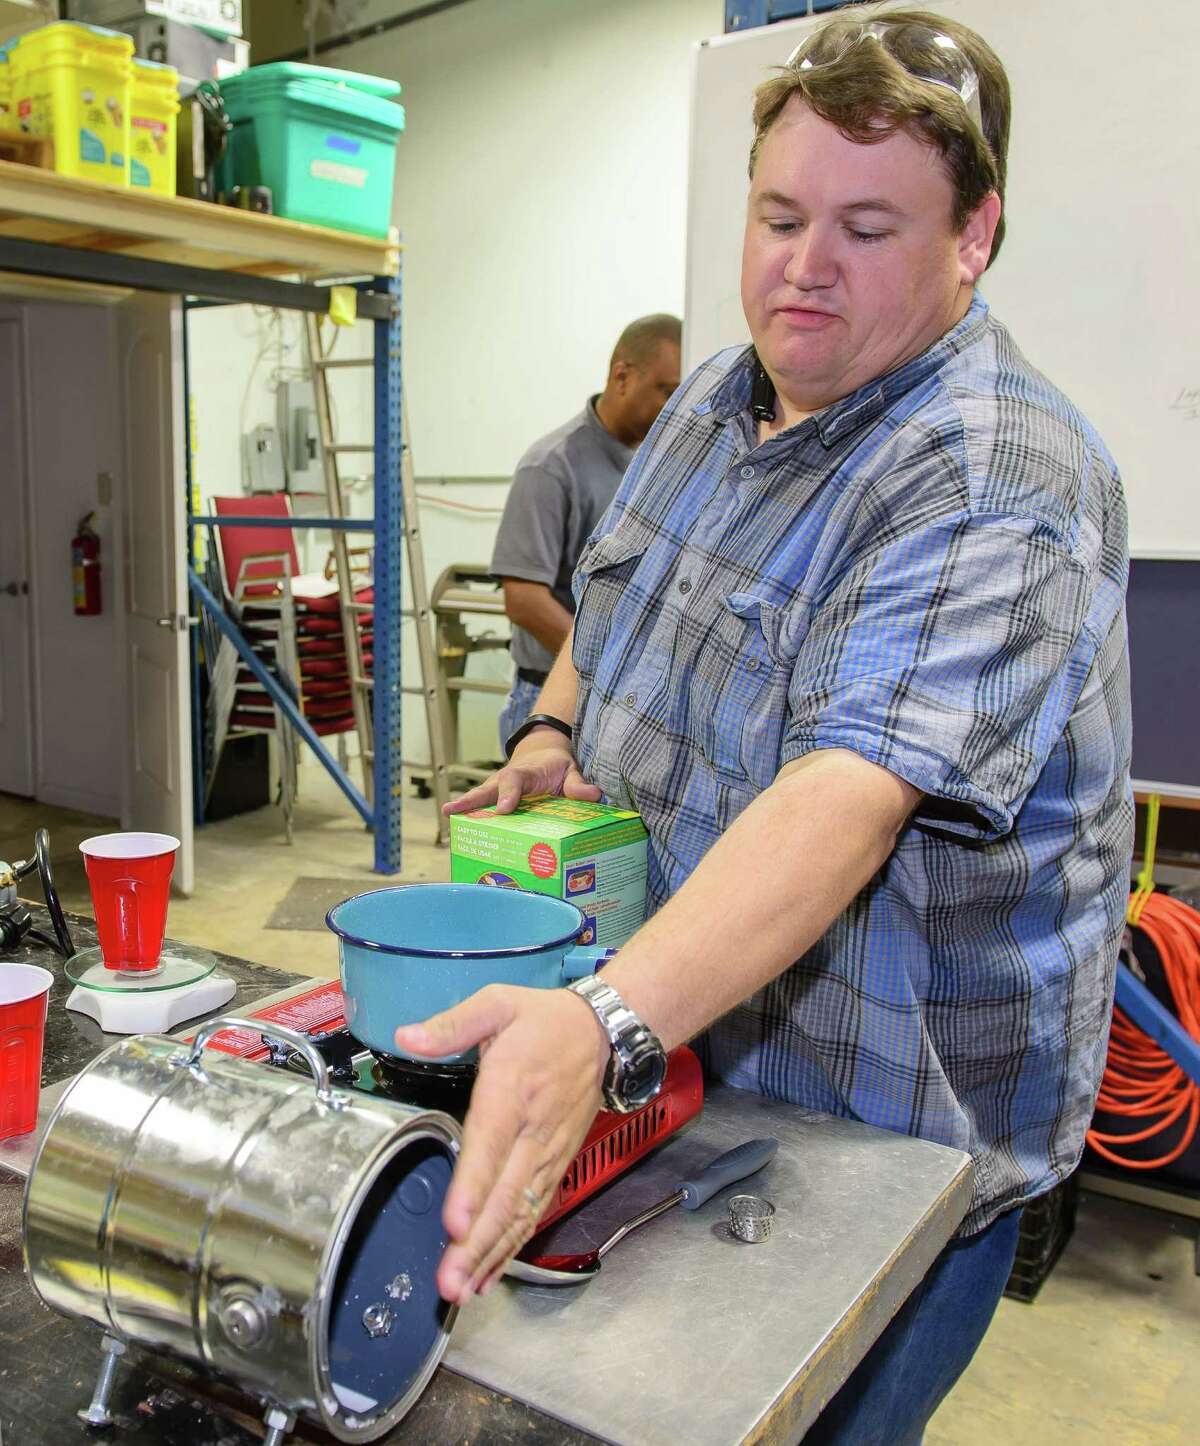 Creatorspace member Ryan Erskine creates high-temperature glue at the creative/tech cooperative workshop.